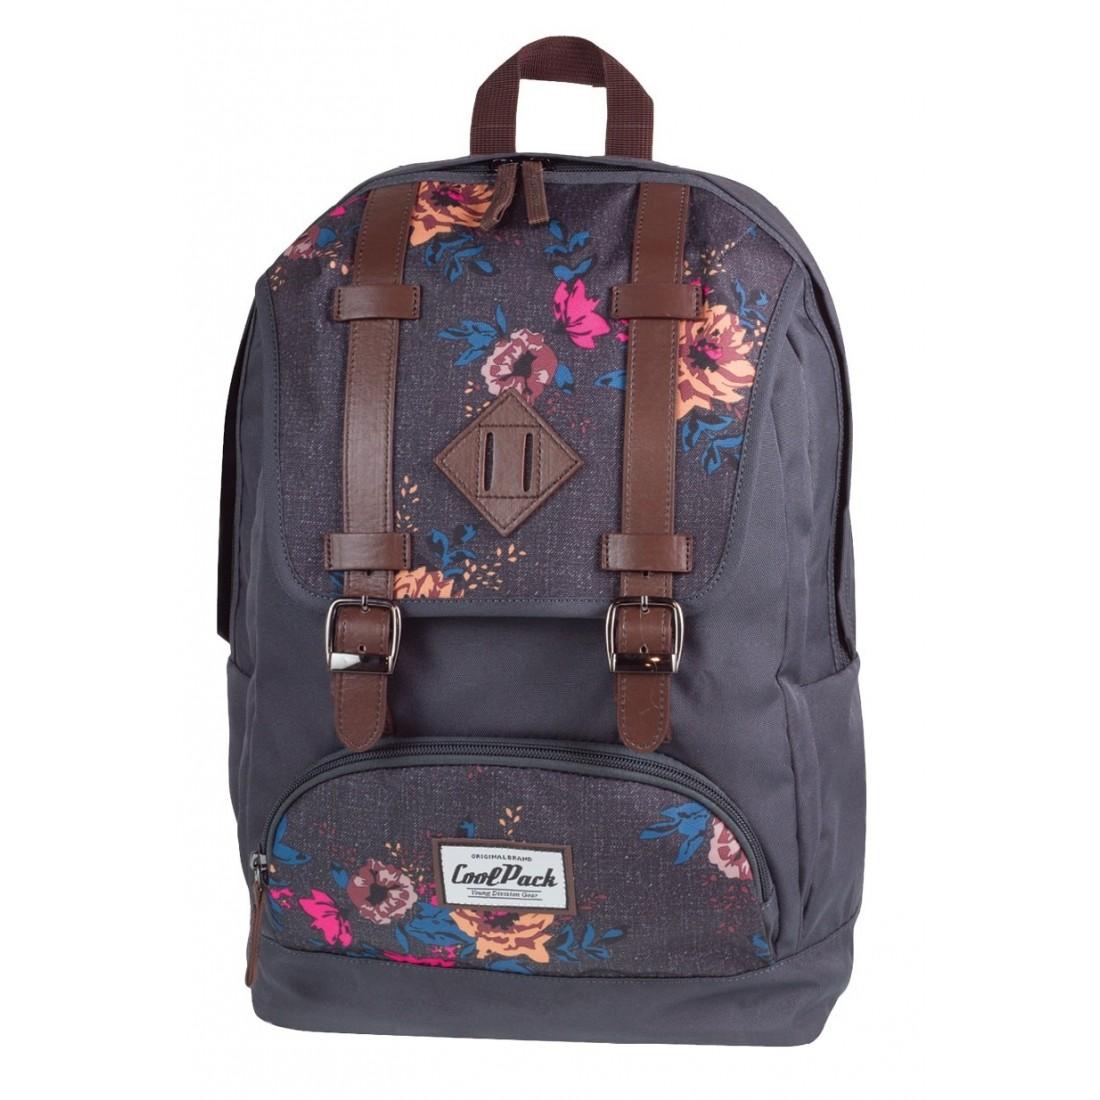 d76791c0b2896 plecak-miejski-coolpack-cp-vintage -city-grey-denim-flowers-1018-szary-w-kwiaty-coolpack.jpg